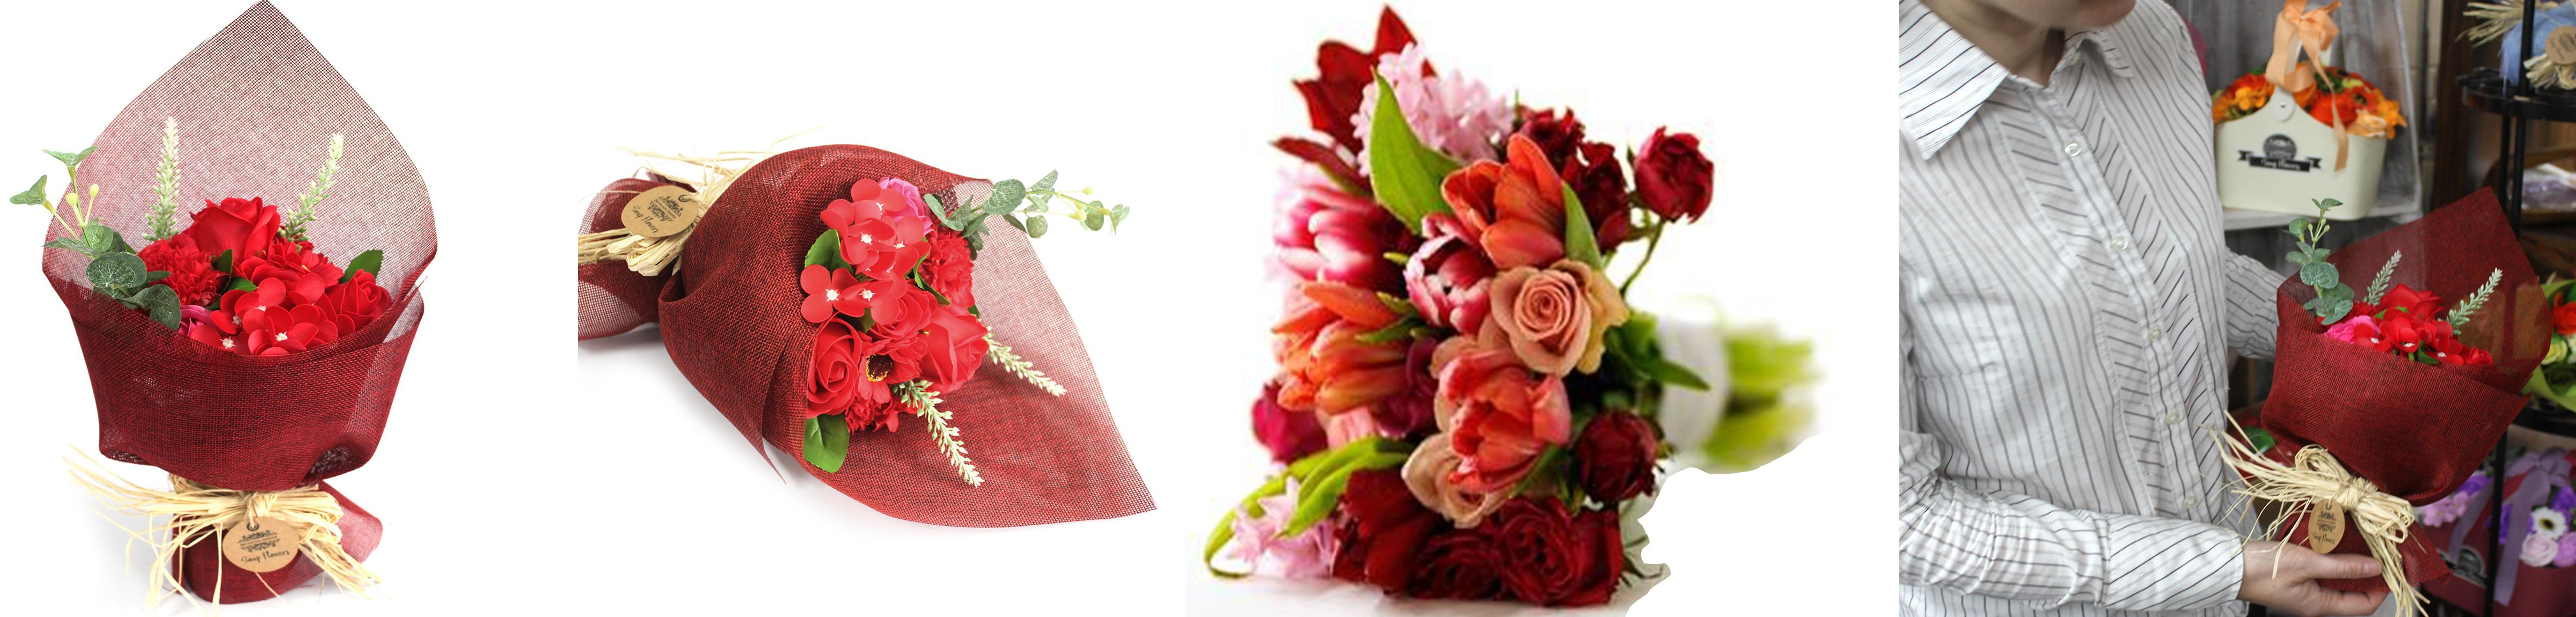 red-flower-bouquet-top-image-1.jpg